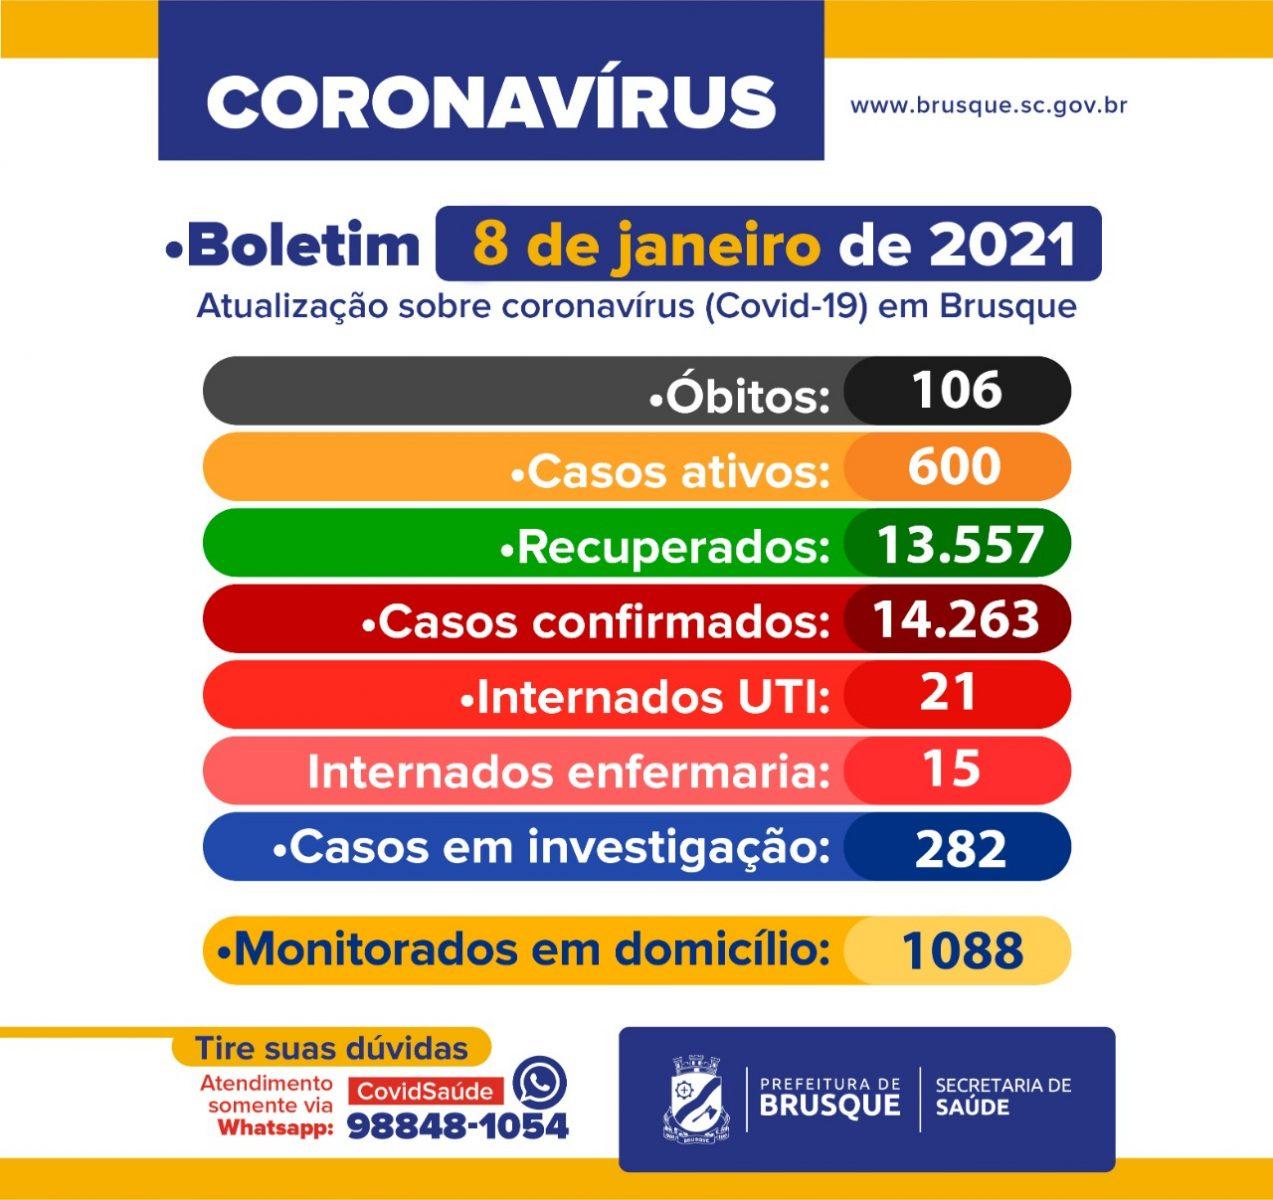 Covid-19: Confira o boletim epidemiológico desta sexta-feira (8)